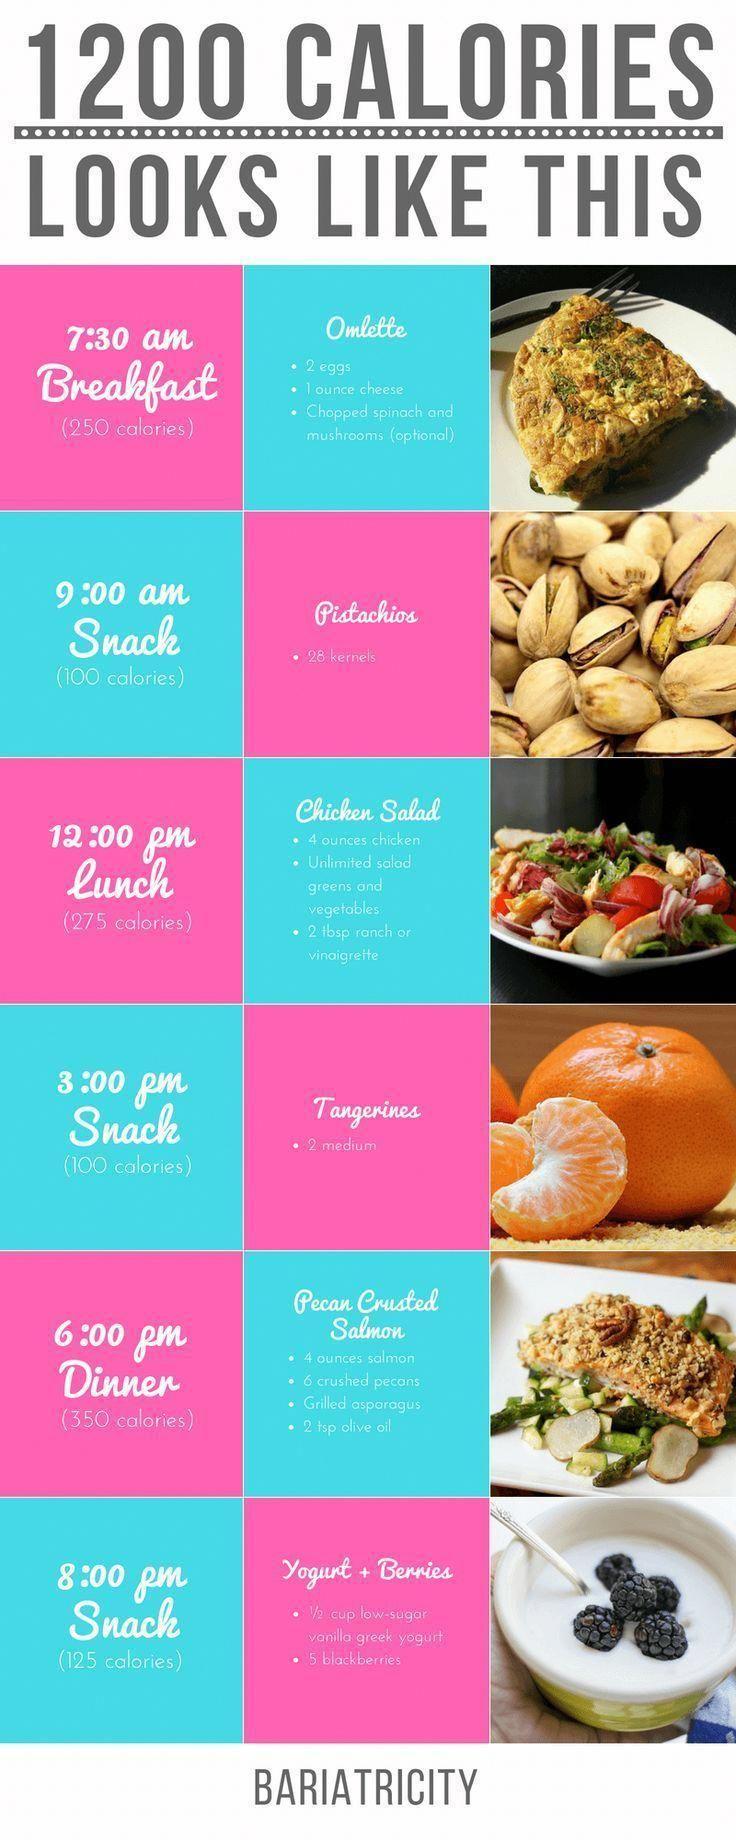 1200 Calorie A Day Keto Meal Plan